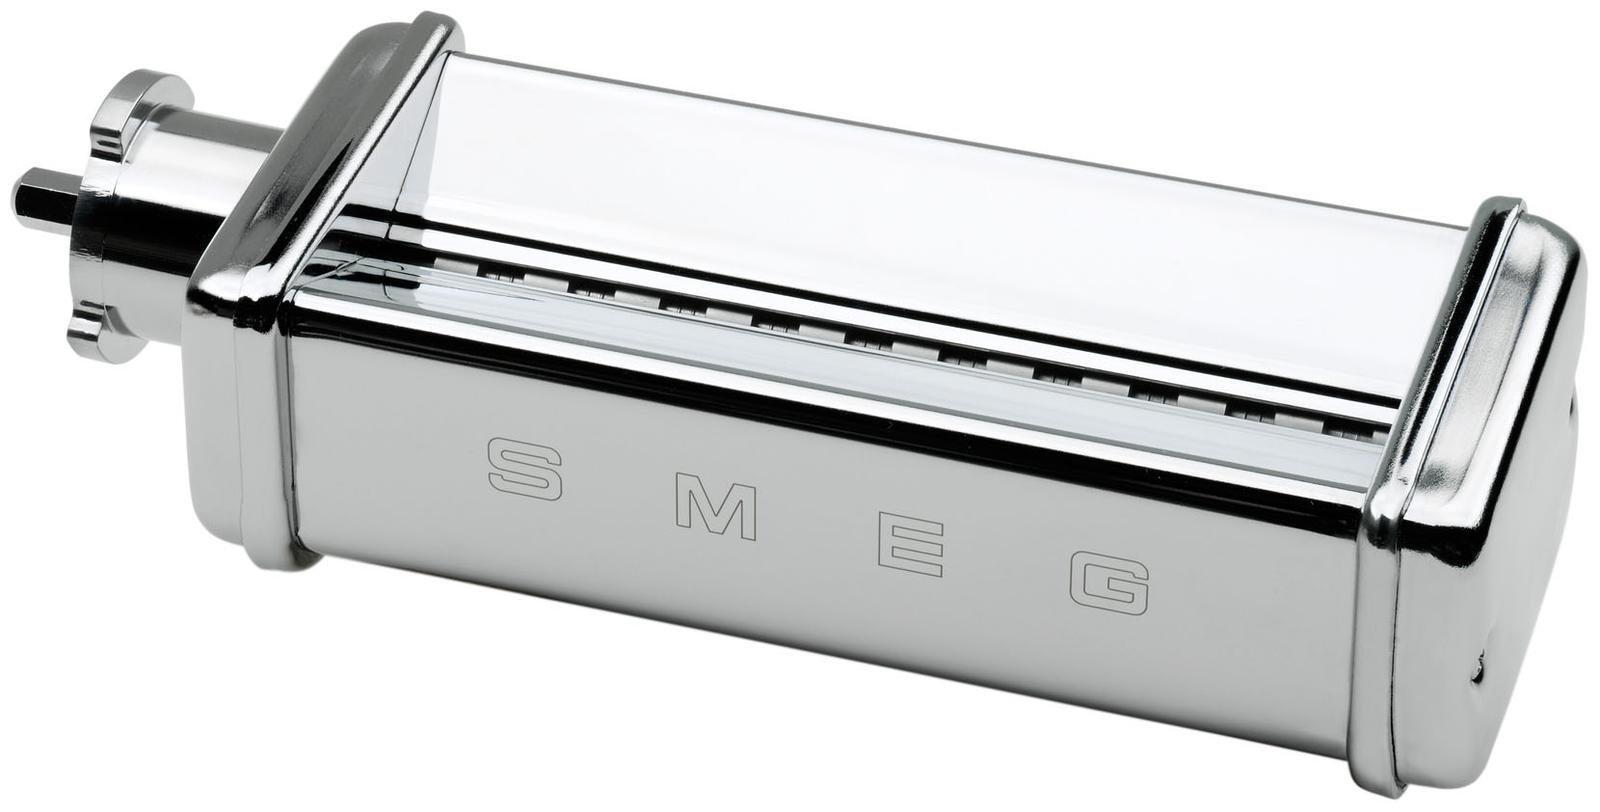 Smeg SMFC01 Fettuccine Accessory, Silver